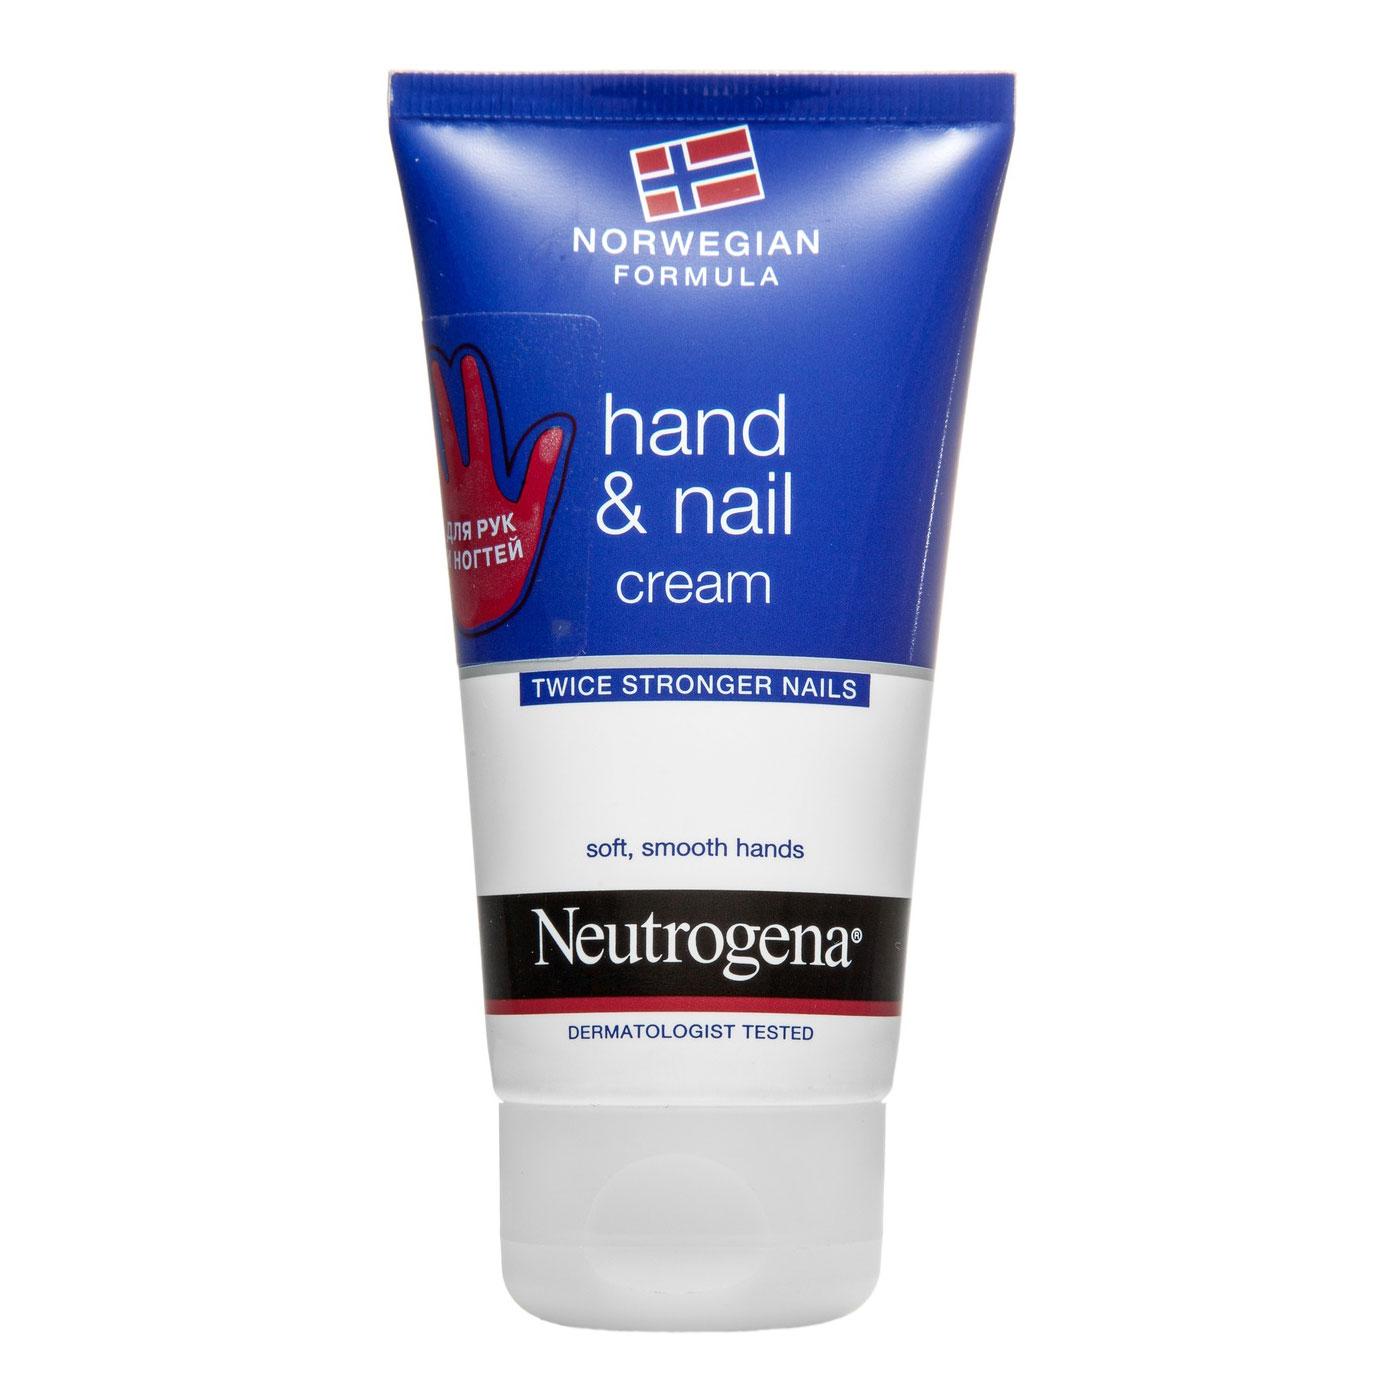 ���� ��� ��� � ������ Neutrogena ���������� ������� 75 ��